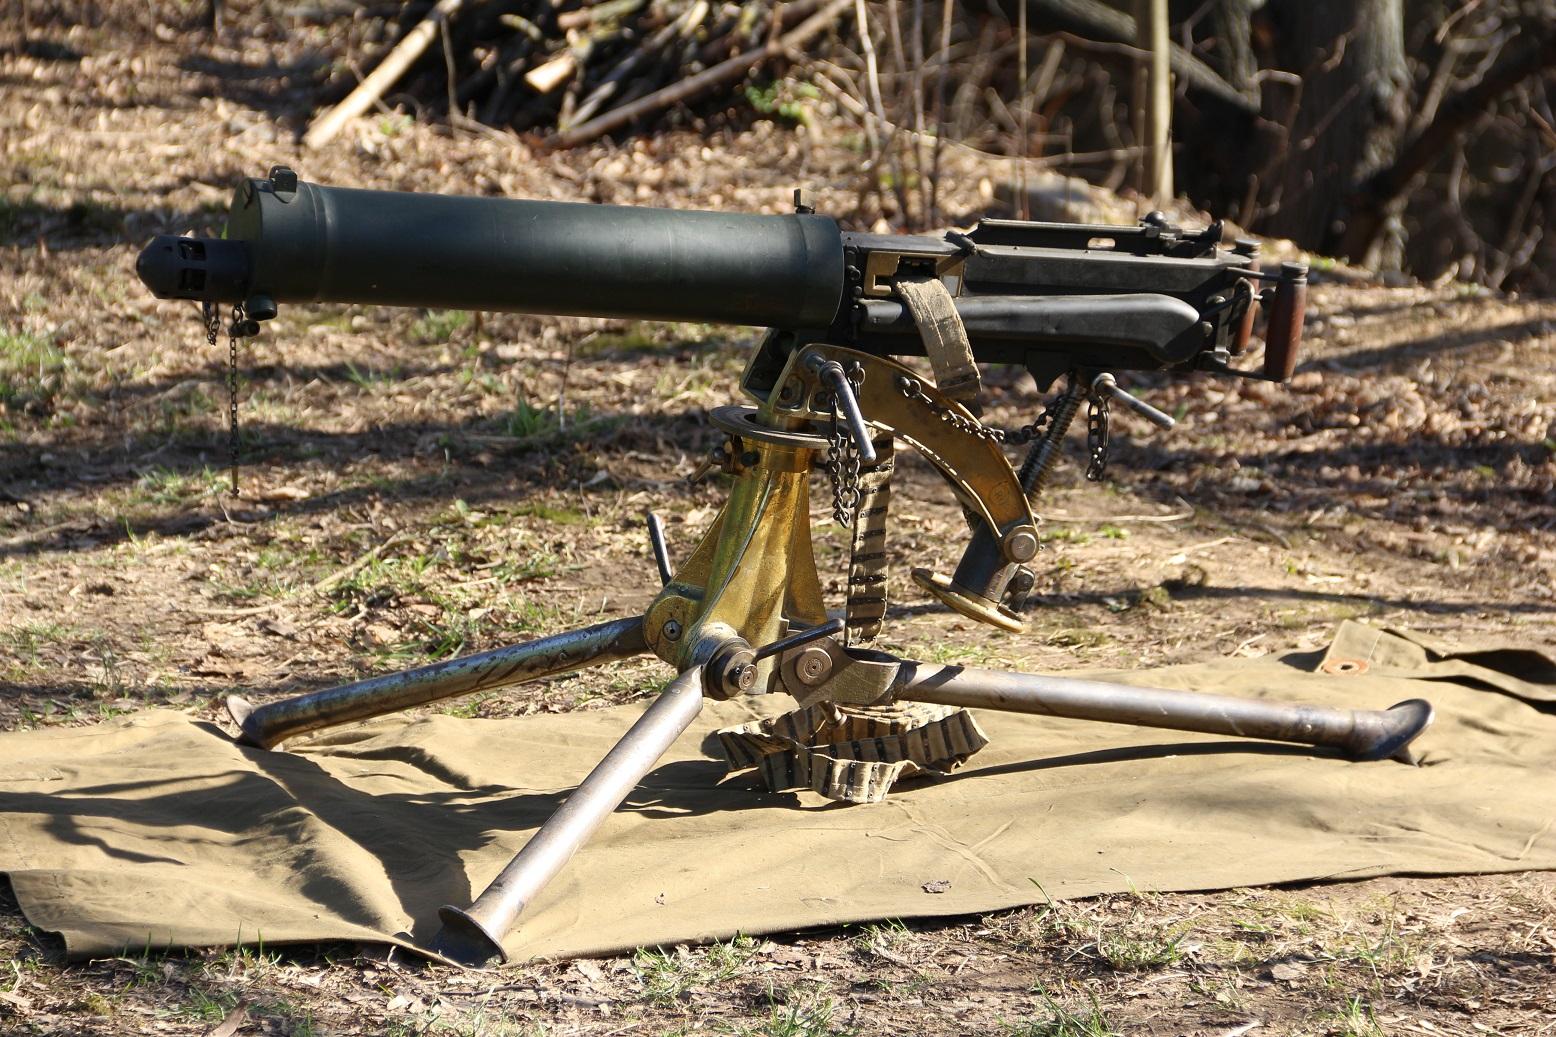 Фото Пулемет Vickers Mk. I калибра .303 #8023, образца 1912 года